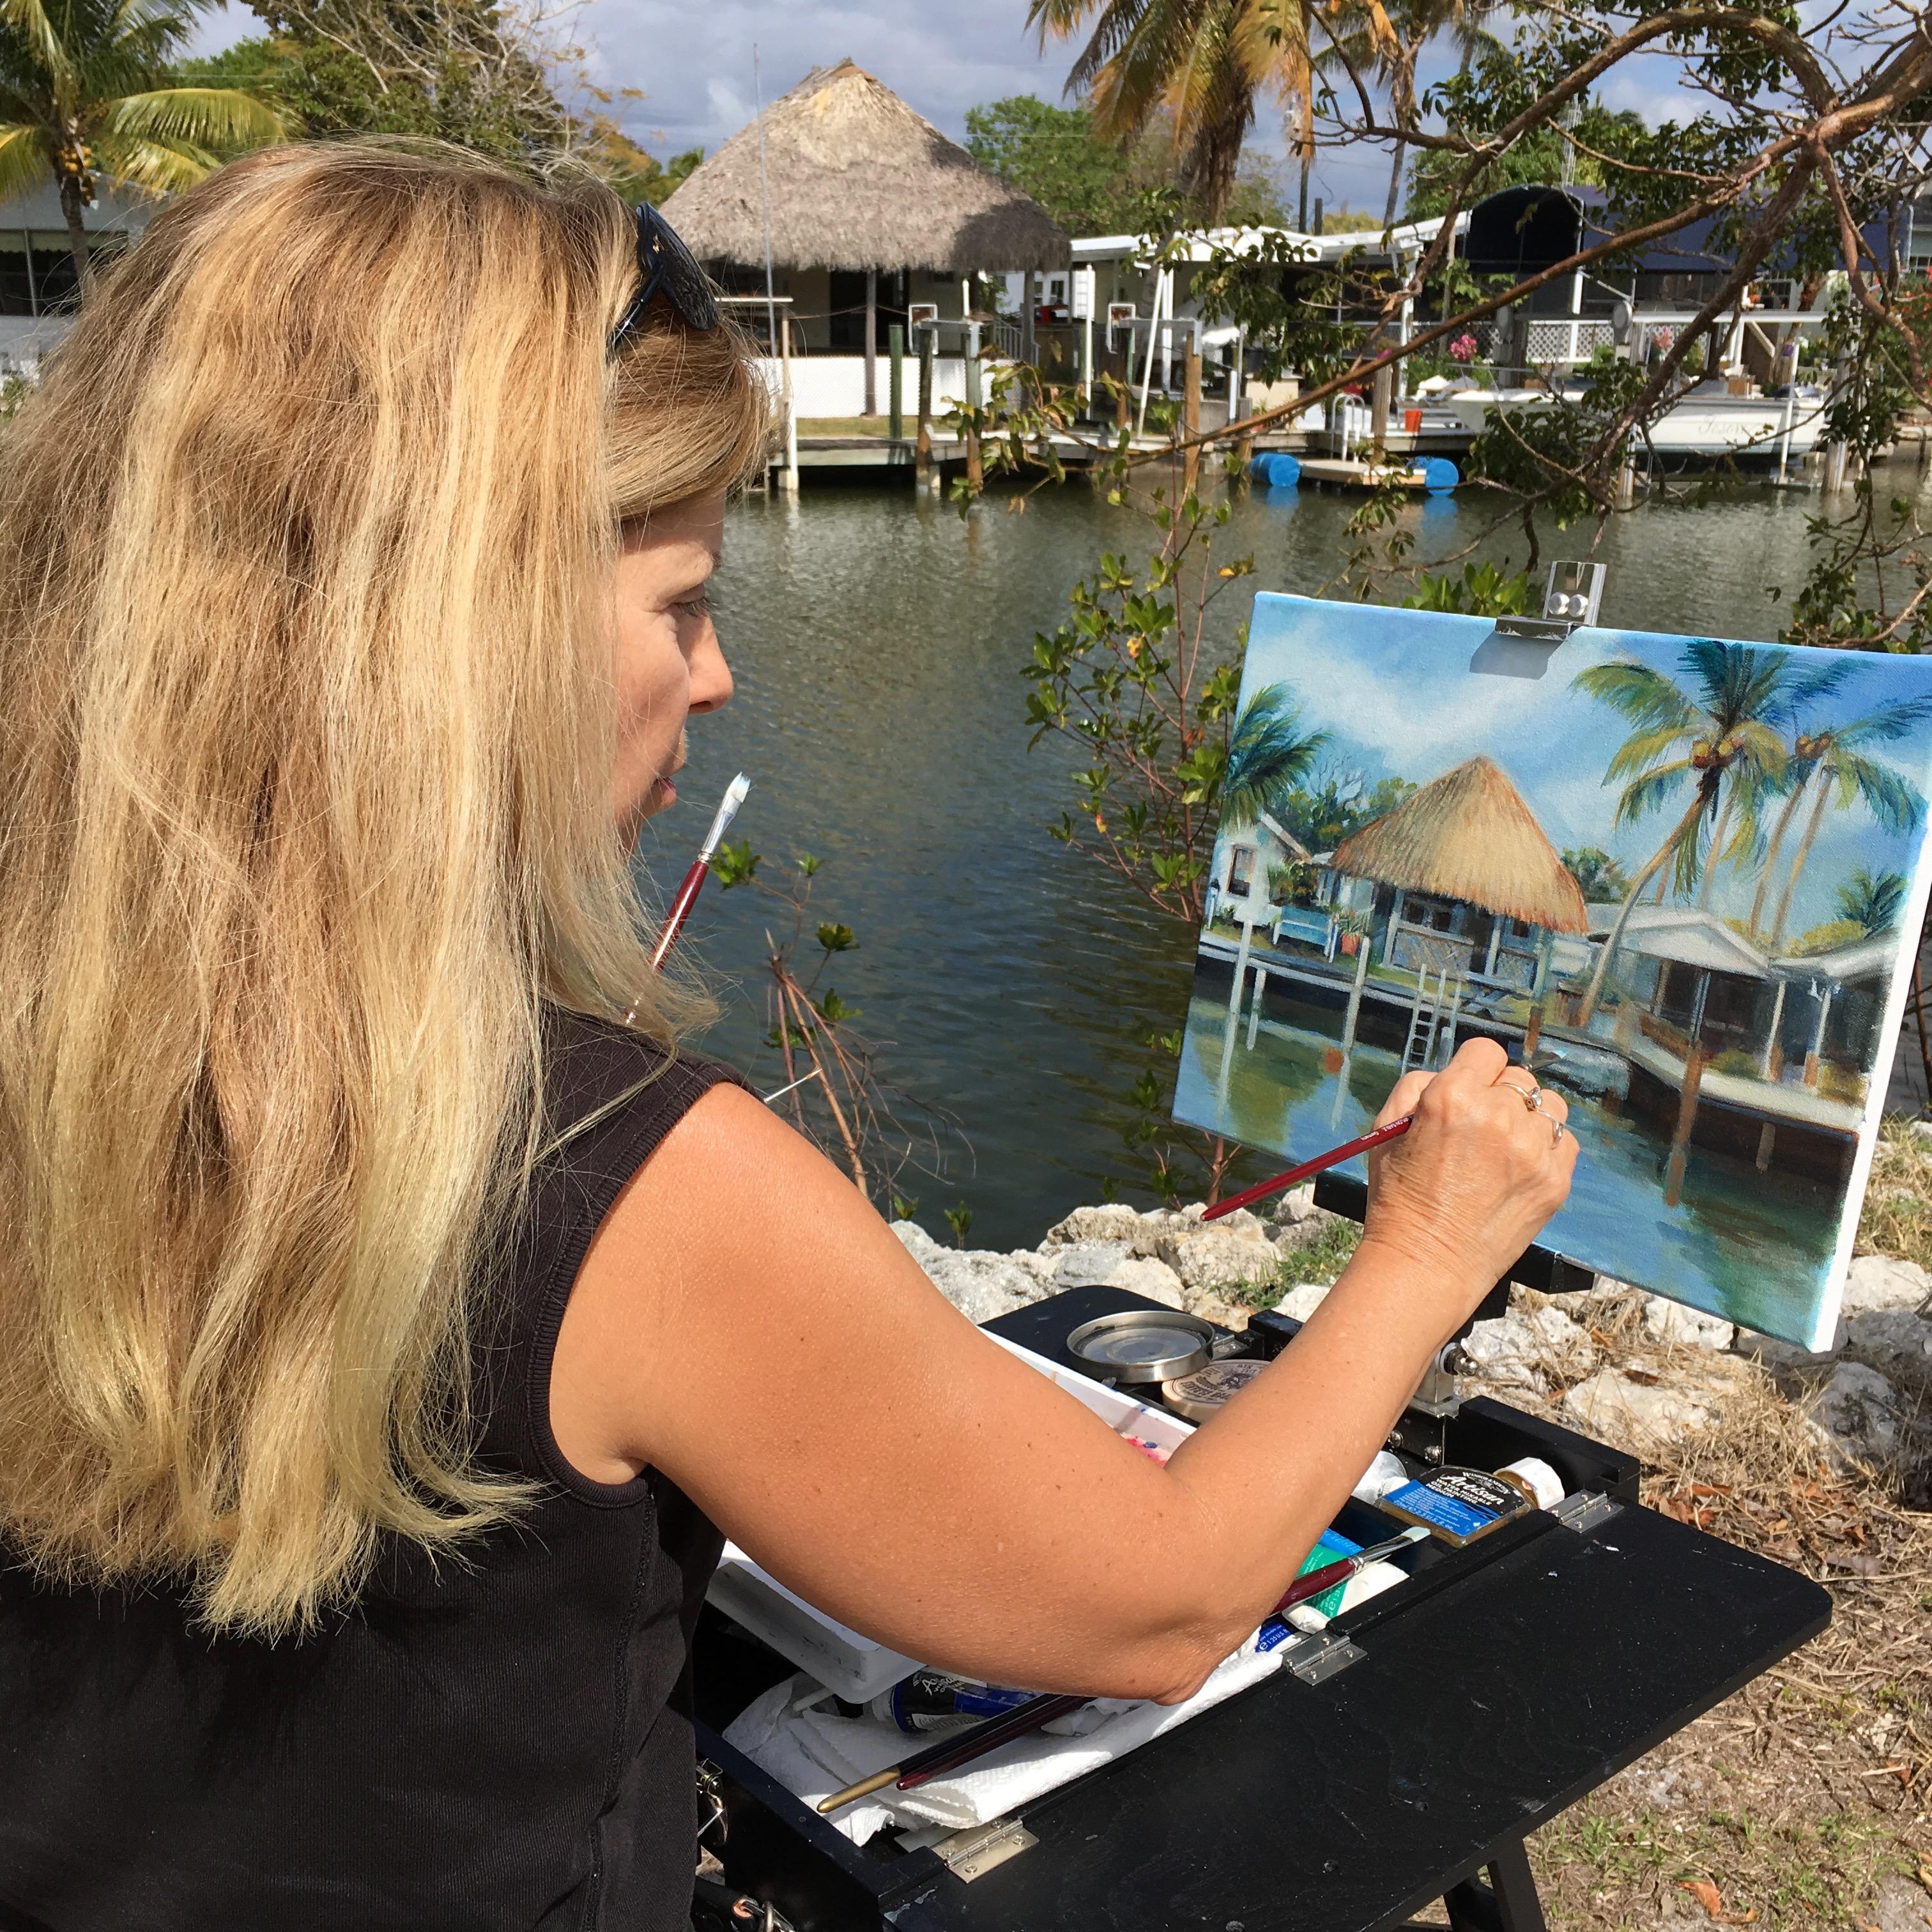 Plein air painting in Goodland, Florida.